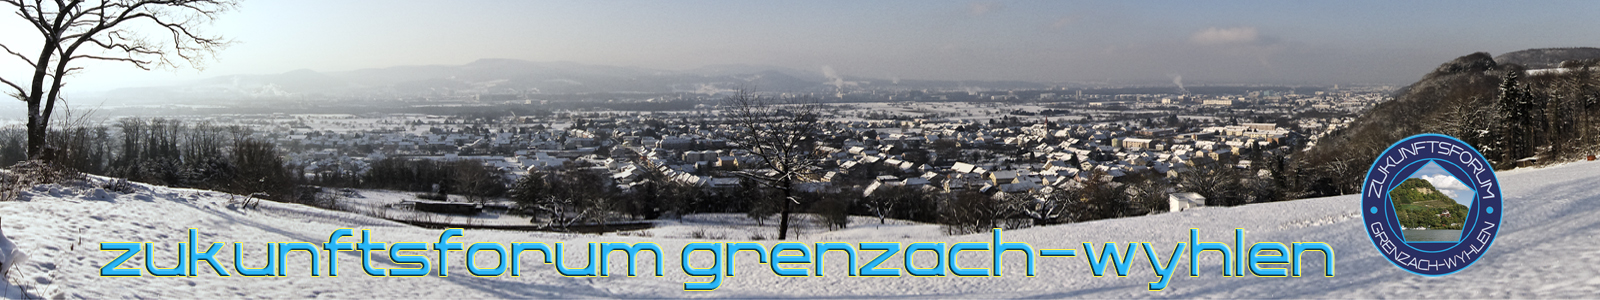 Zukunftsforum Grenzach-Wyhlen e.V.